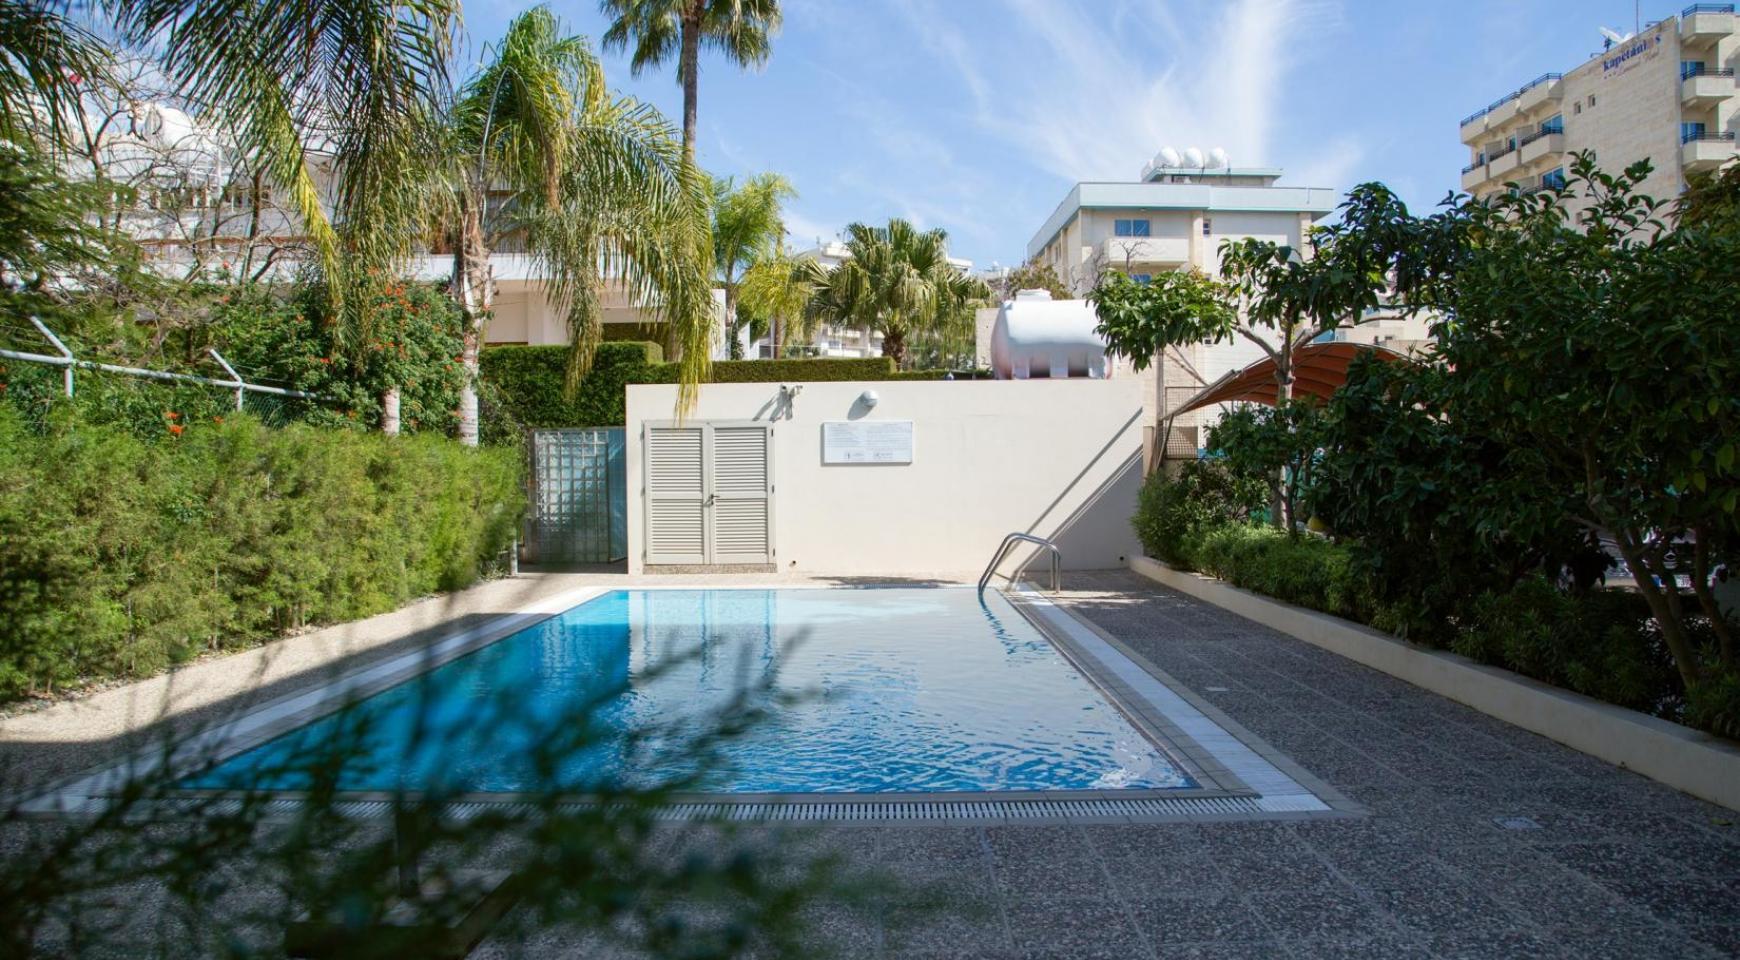 Luxury 3 Bedroom Apartment in Enaerios Area near the Sea - 26